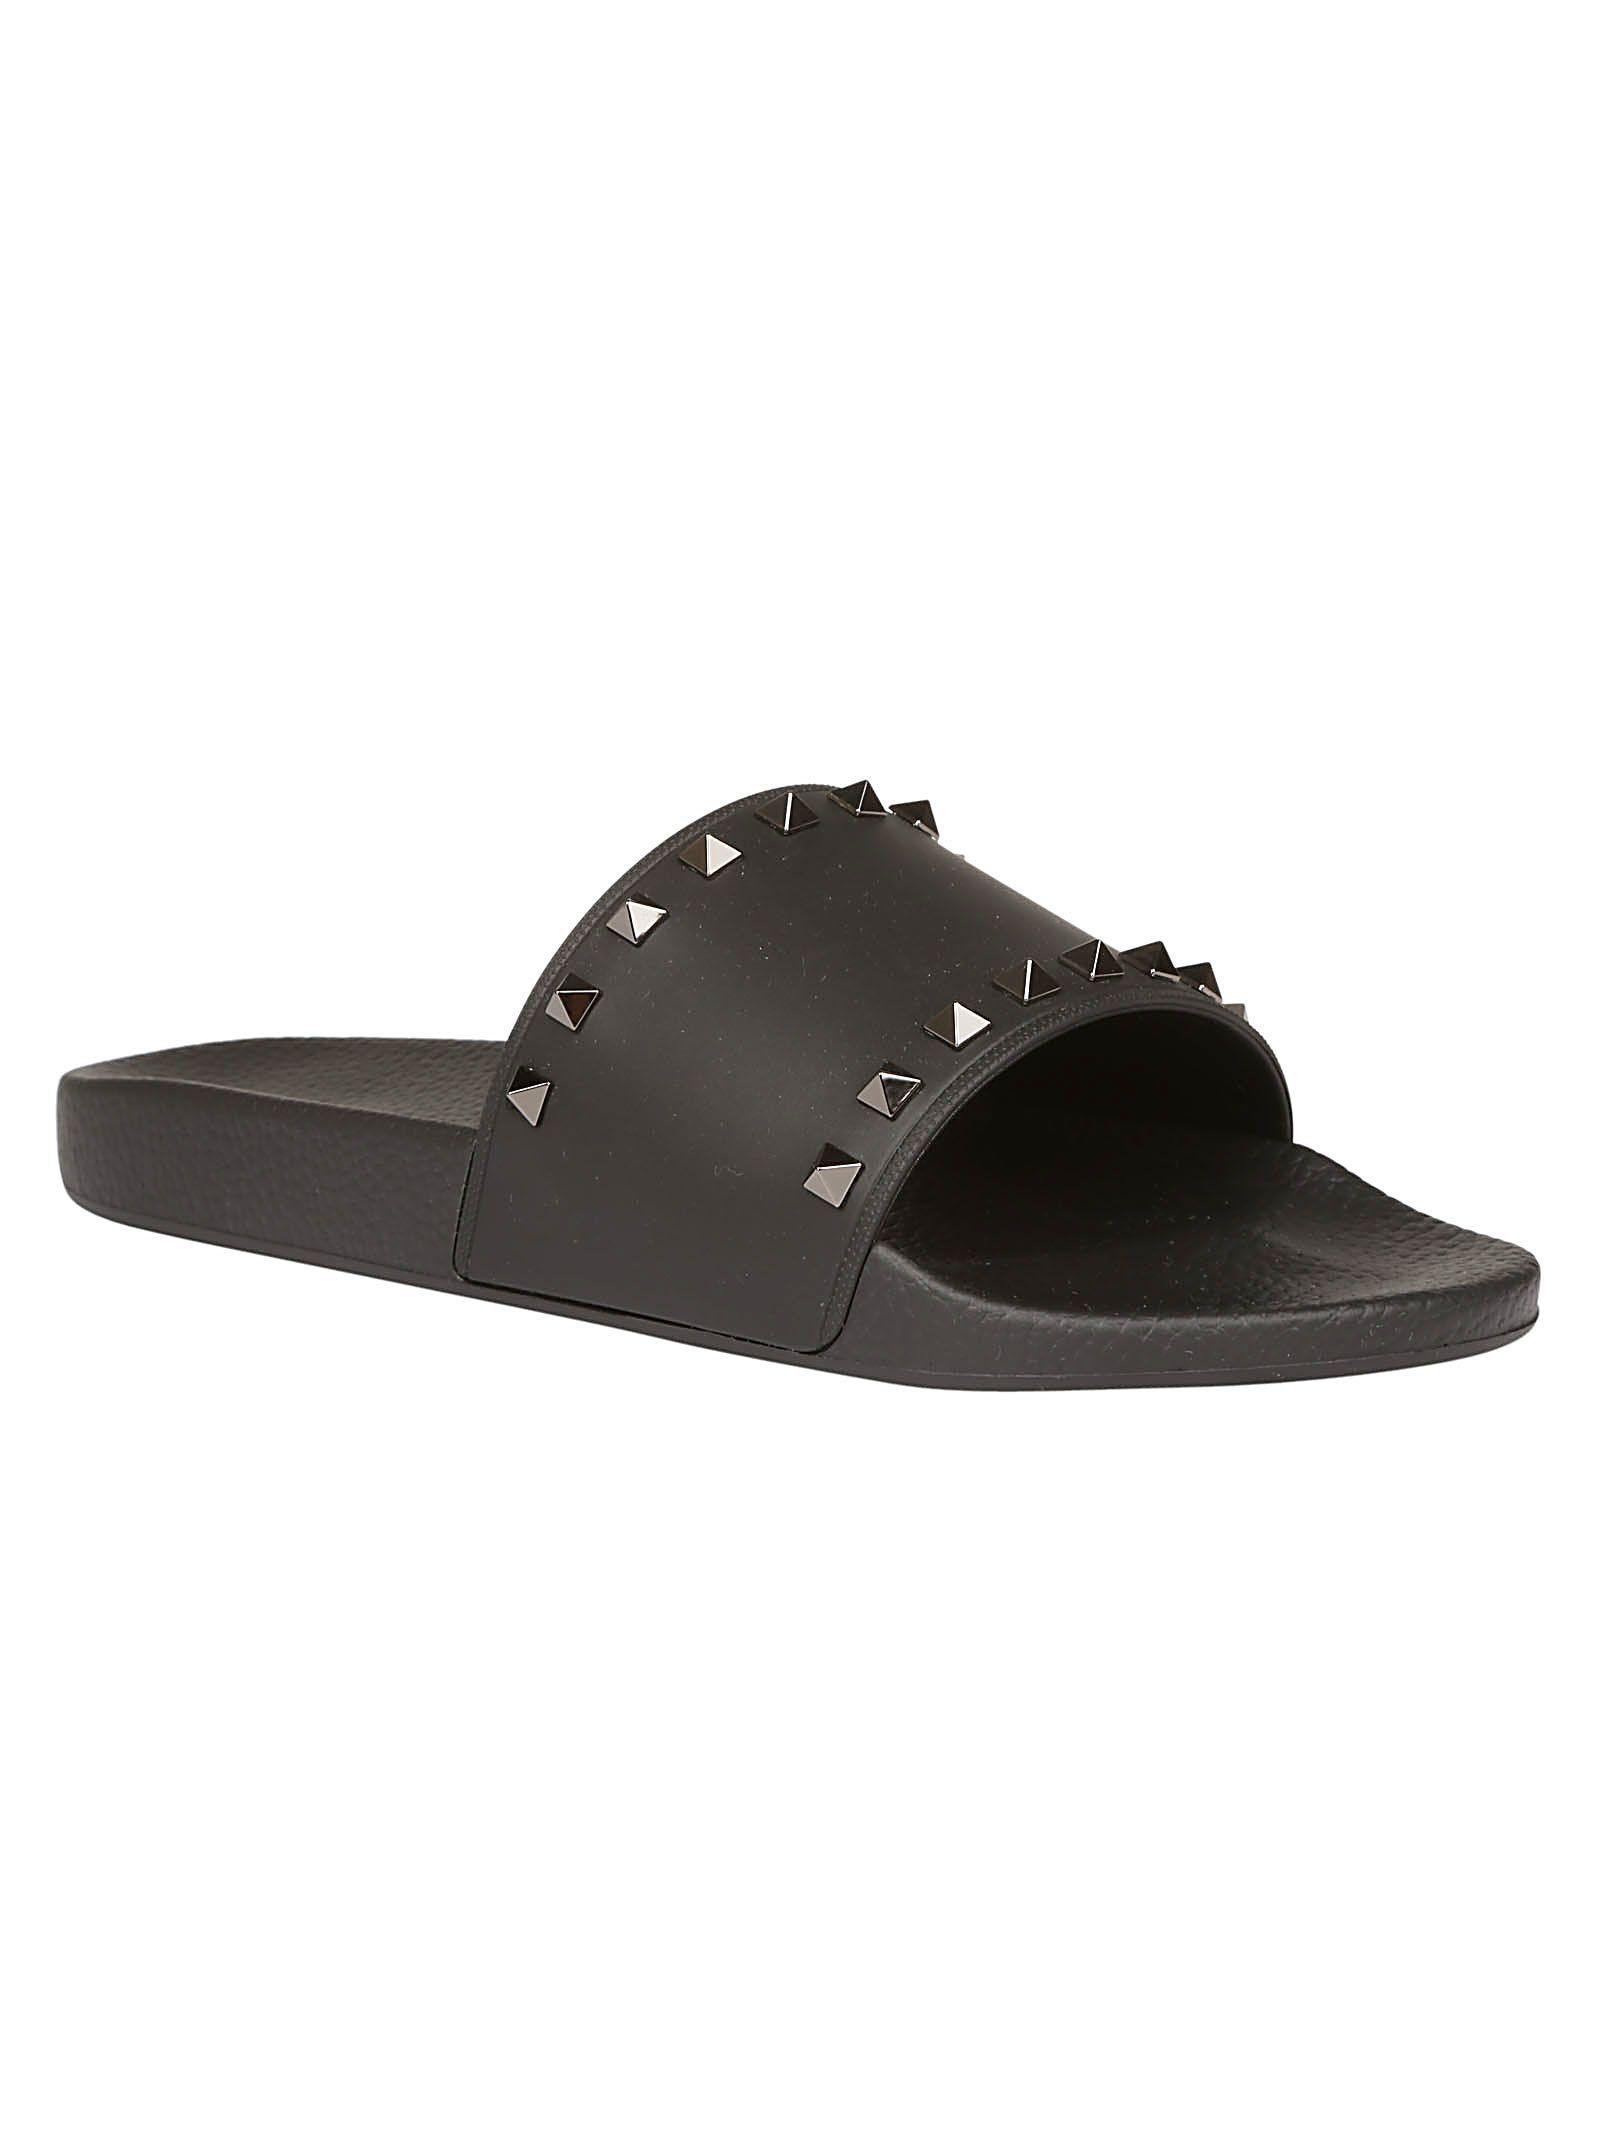 a0c8bf4dbf55 VALENTINO SLIDERS.  valentino  shoes